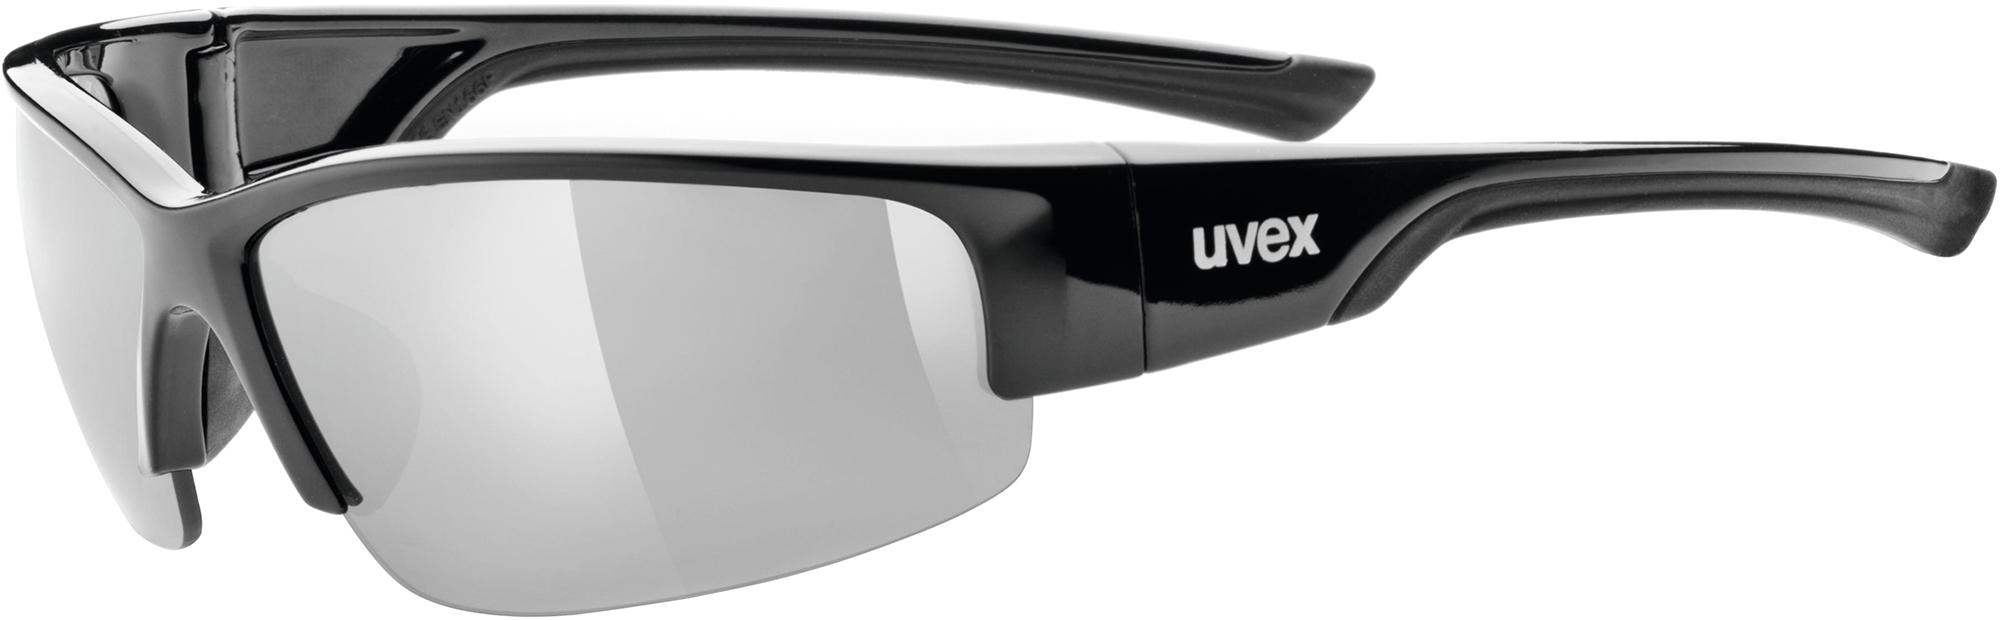 Uvex Солнцезащитные очки Sportstyle 215